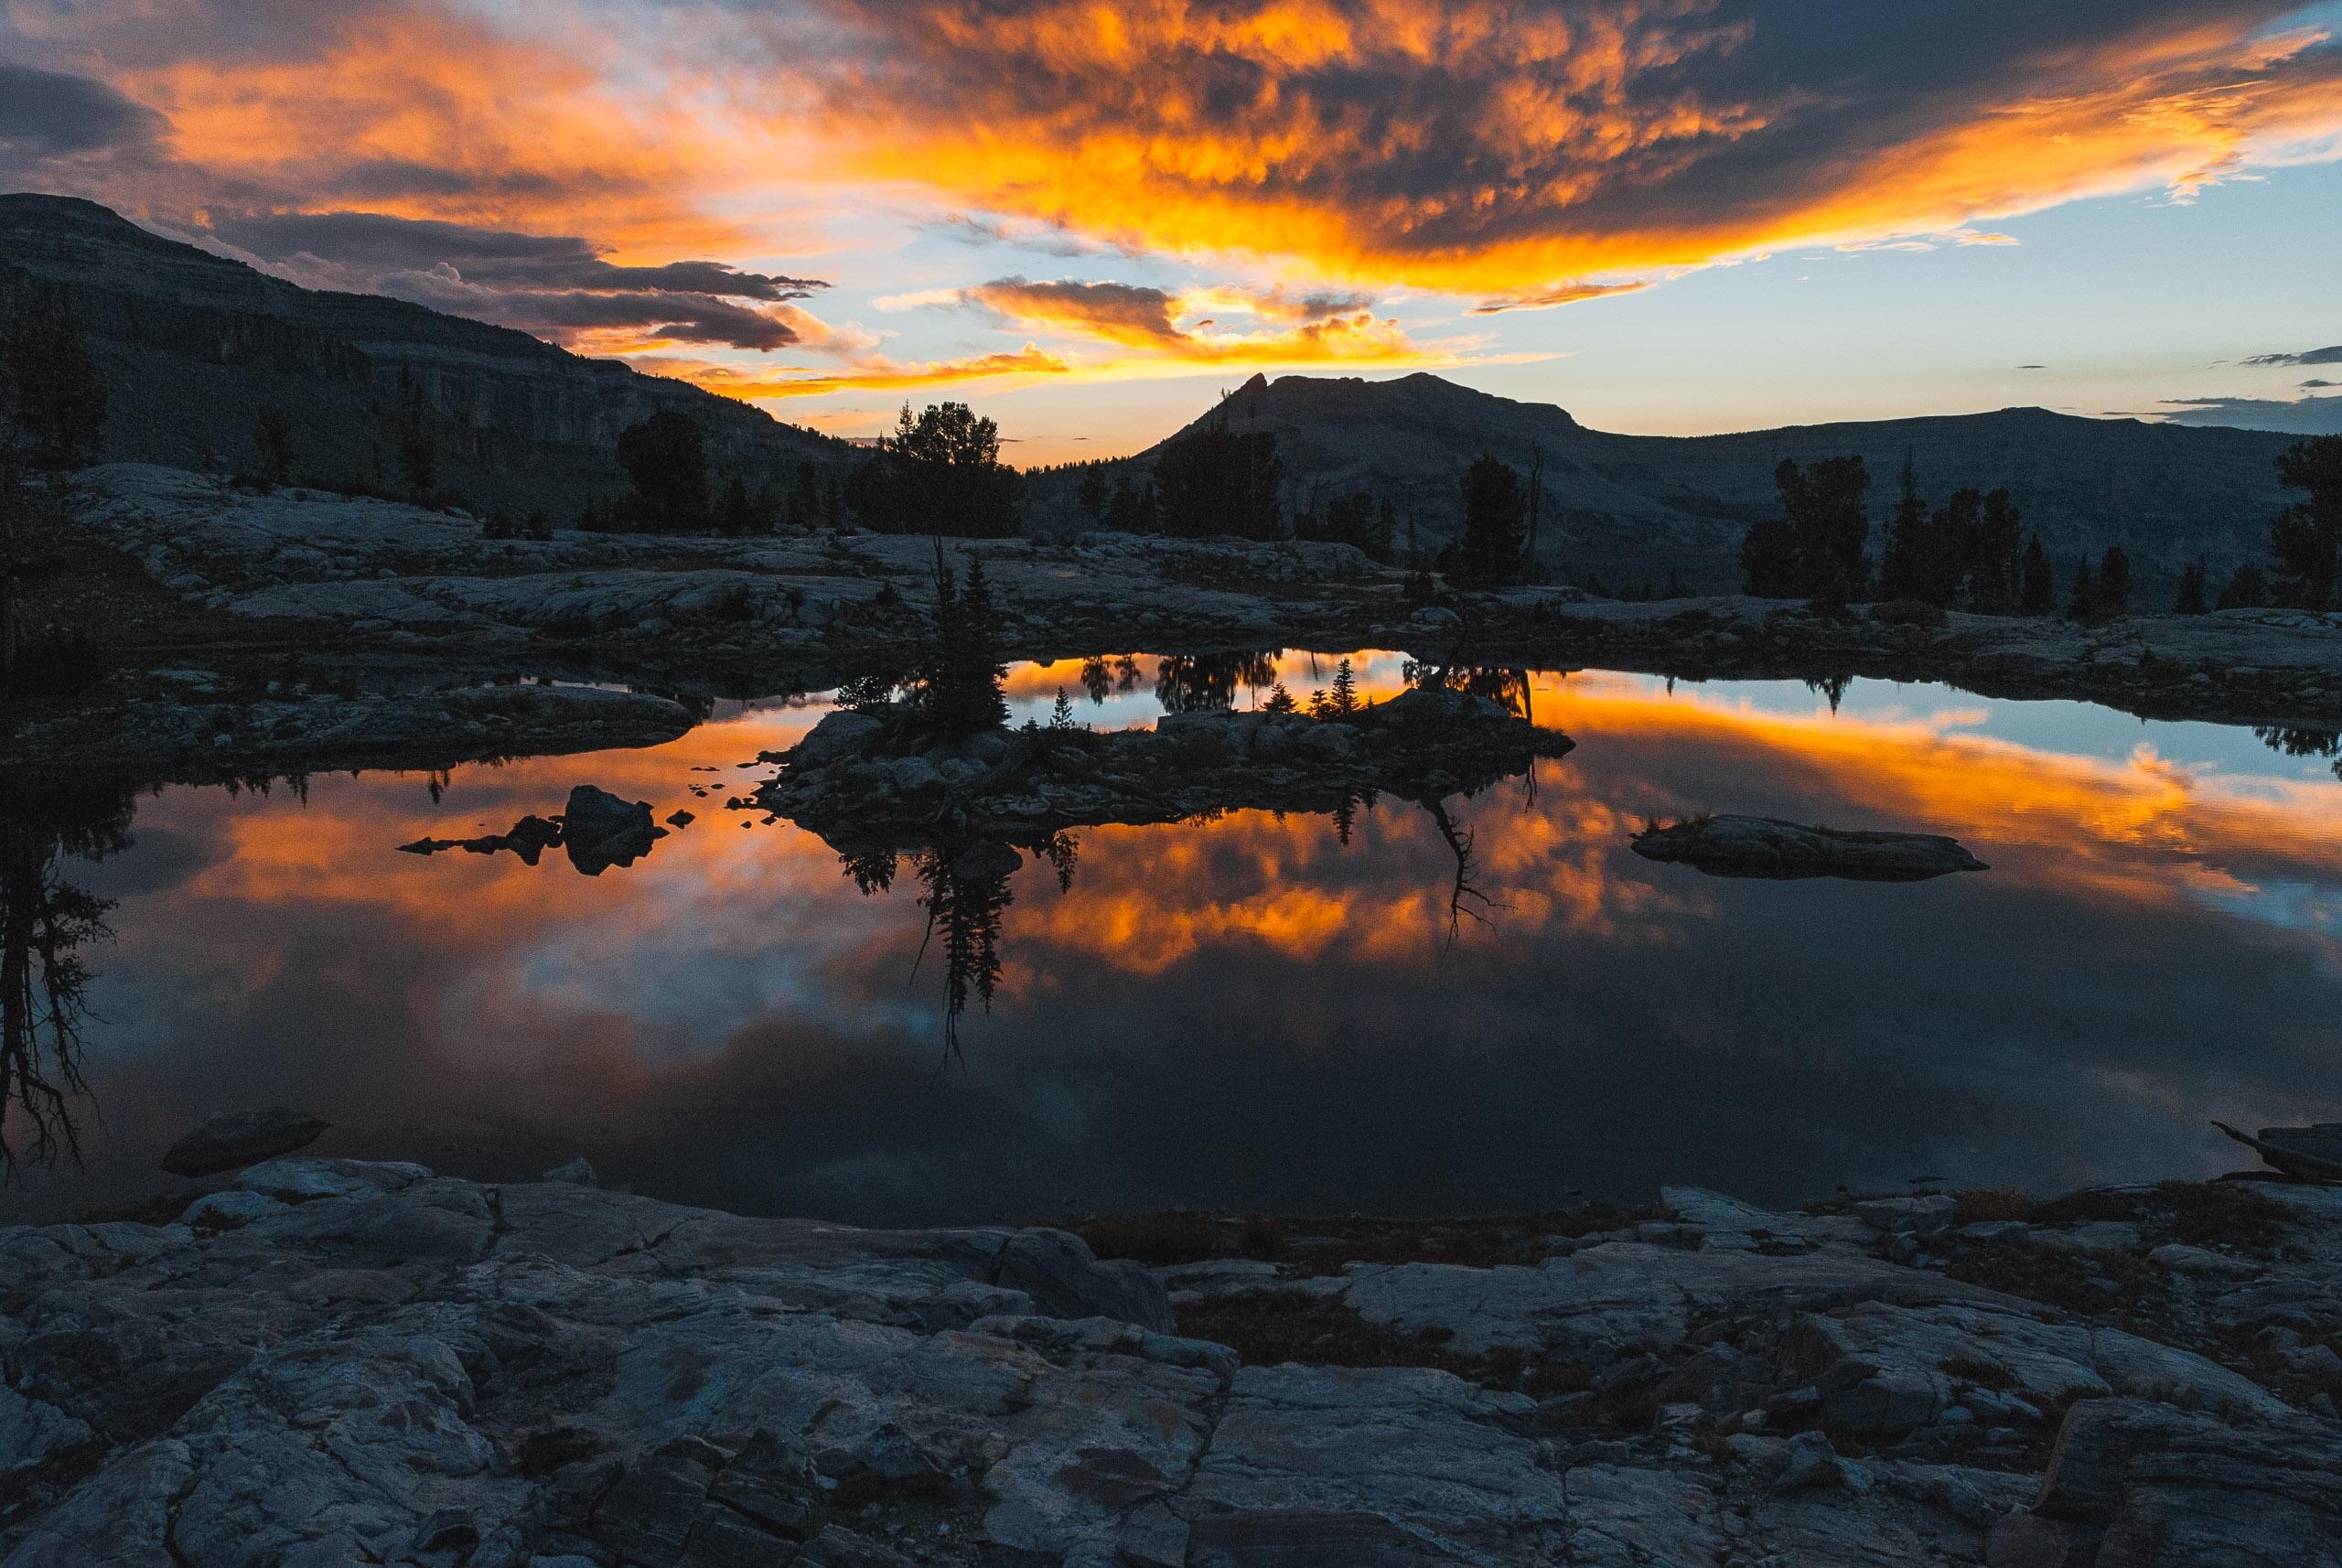 Grand Teton National Park - 2007-0902-DSC_0119_14359